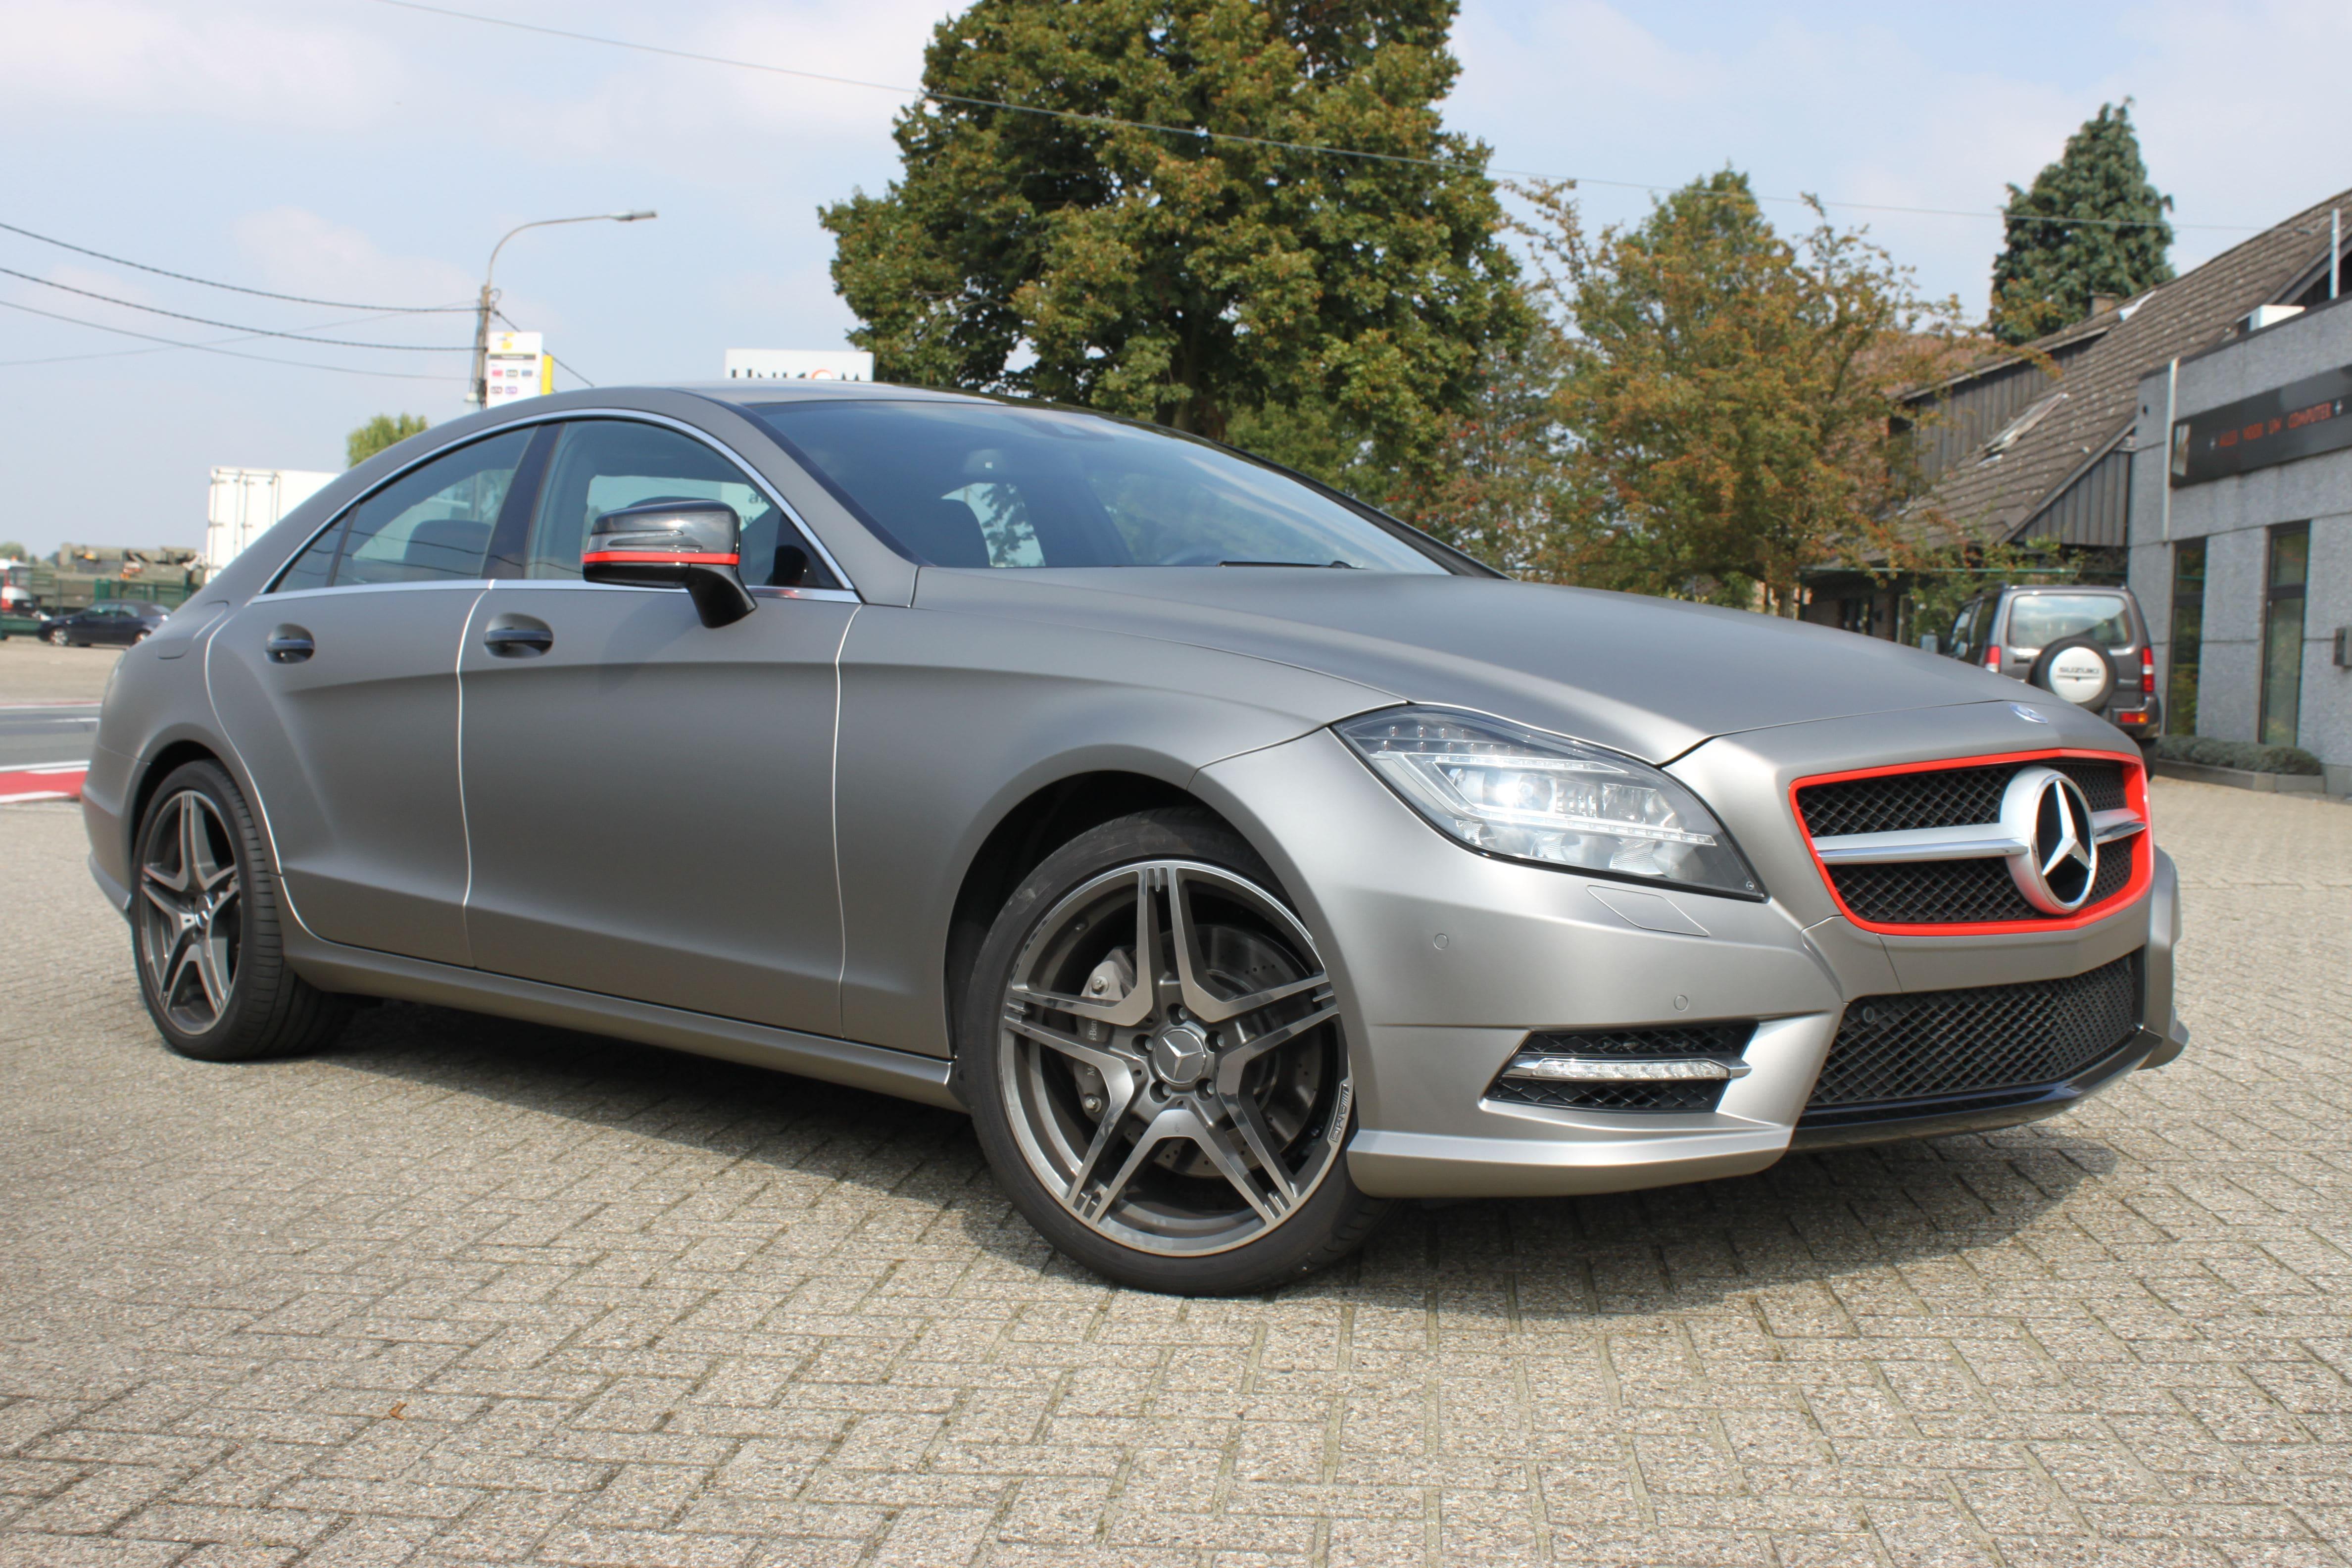 Mercedes CLS met Mat Grey Aluminium Wrap, Carwrapping door Wrapmyride.nu Foto-nr:6160, ©2020